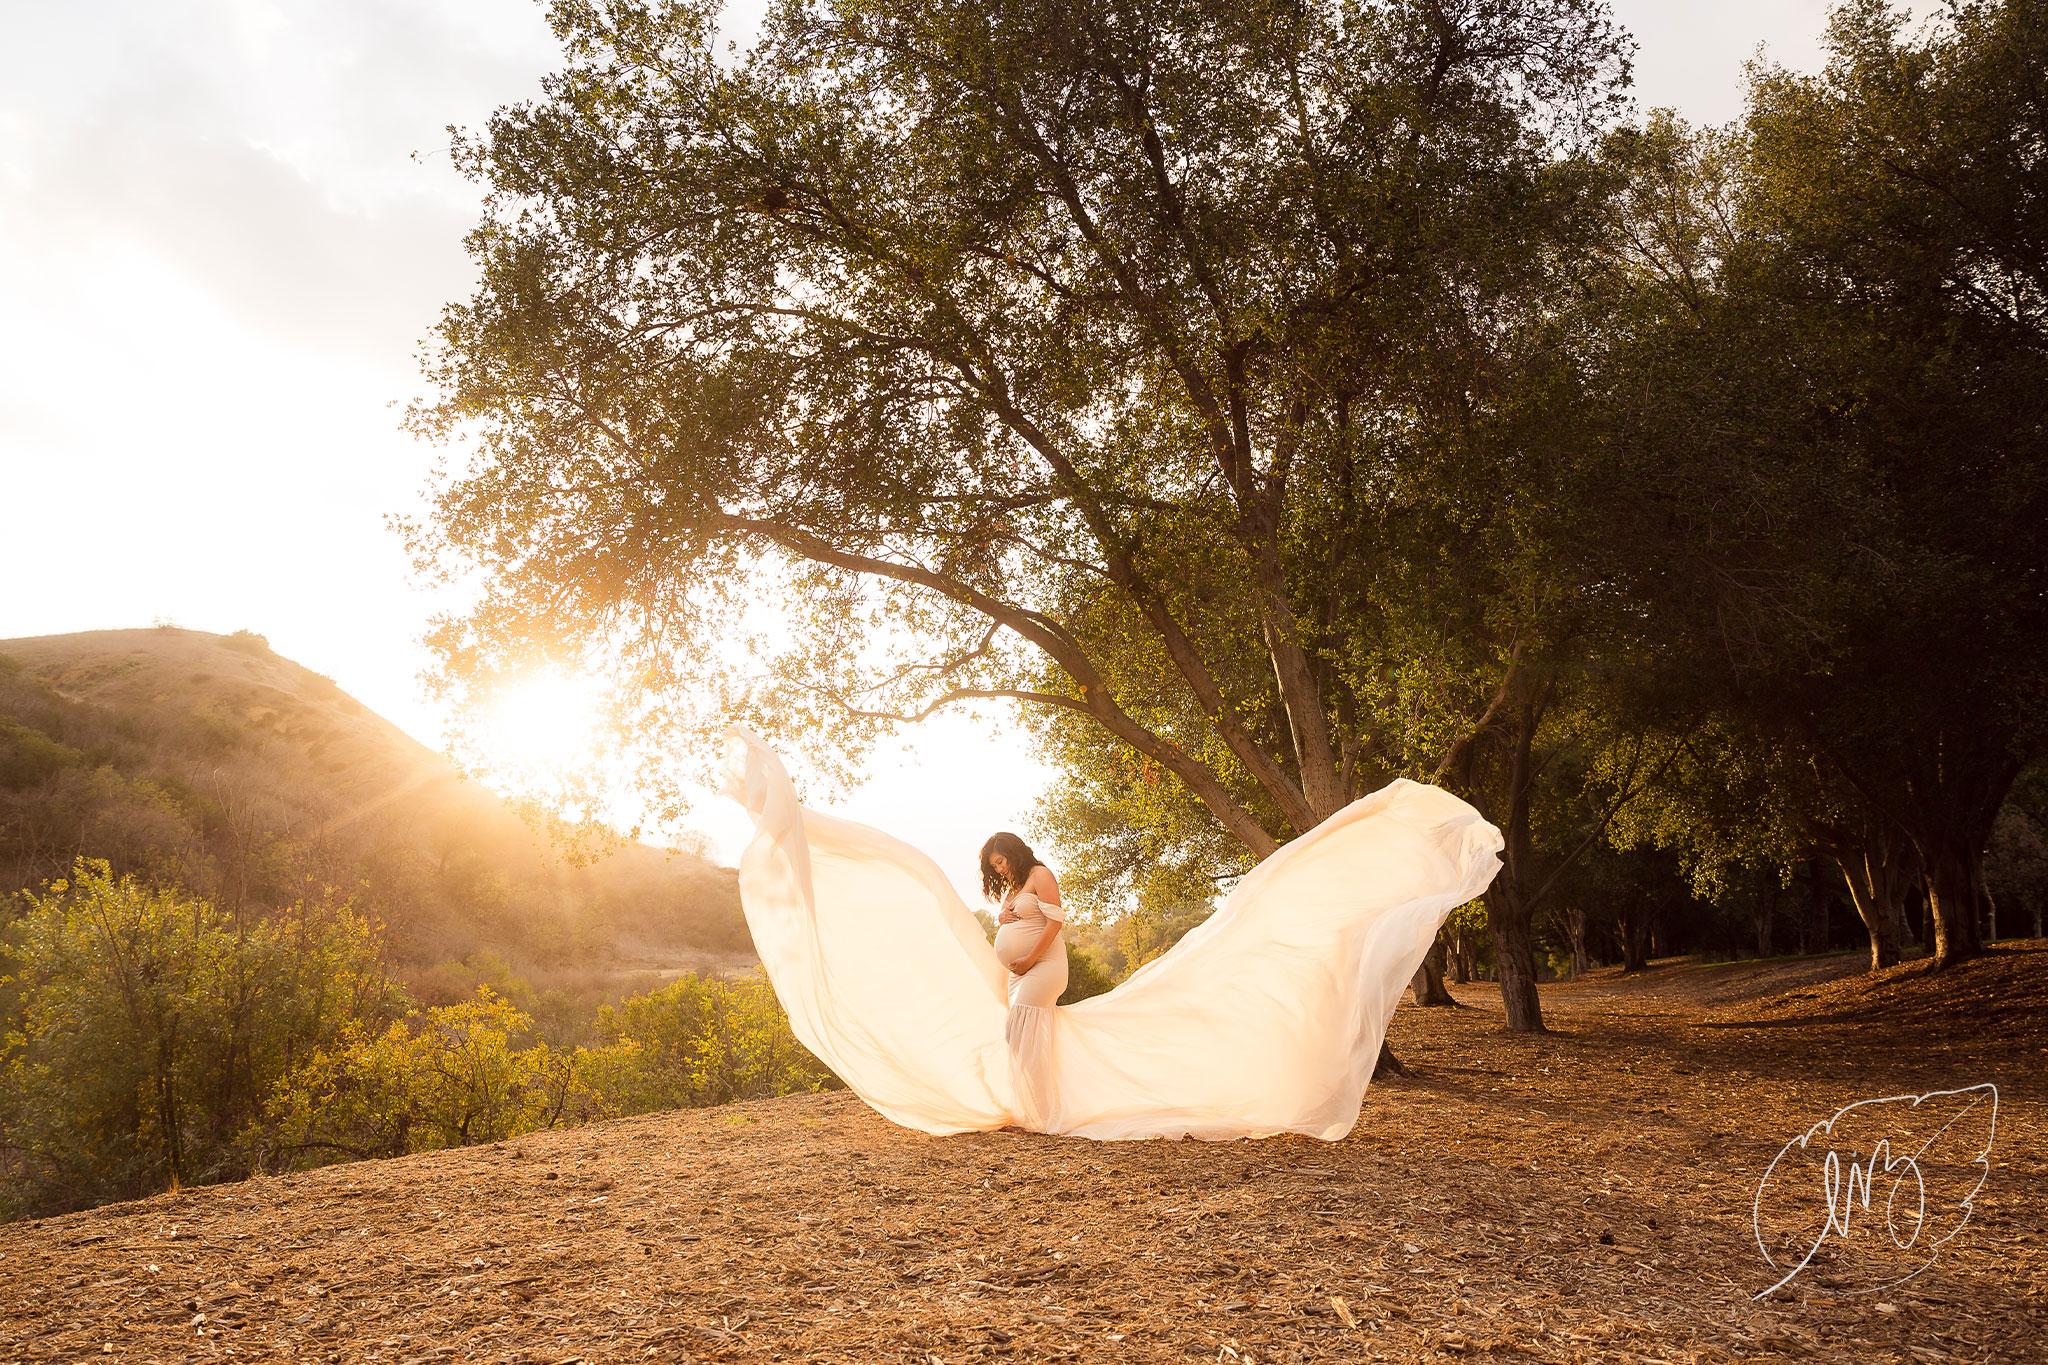 California_Inland_Empire_Maternity_Photographer_09.jpg